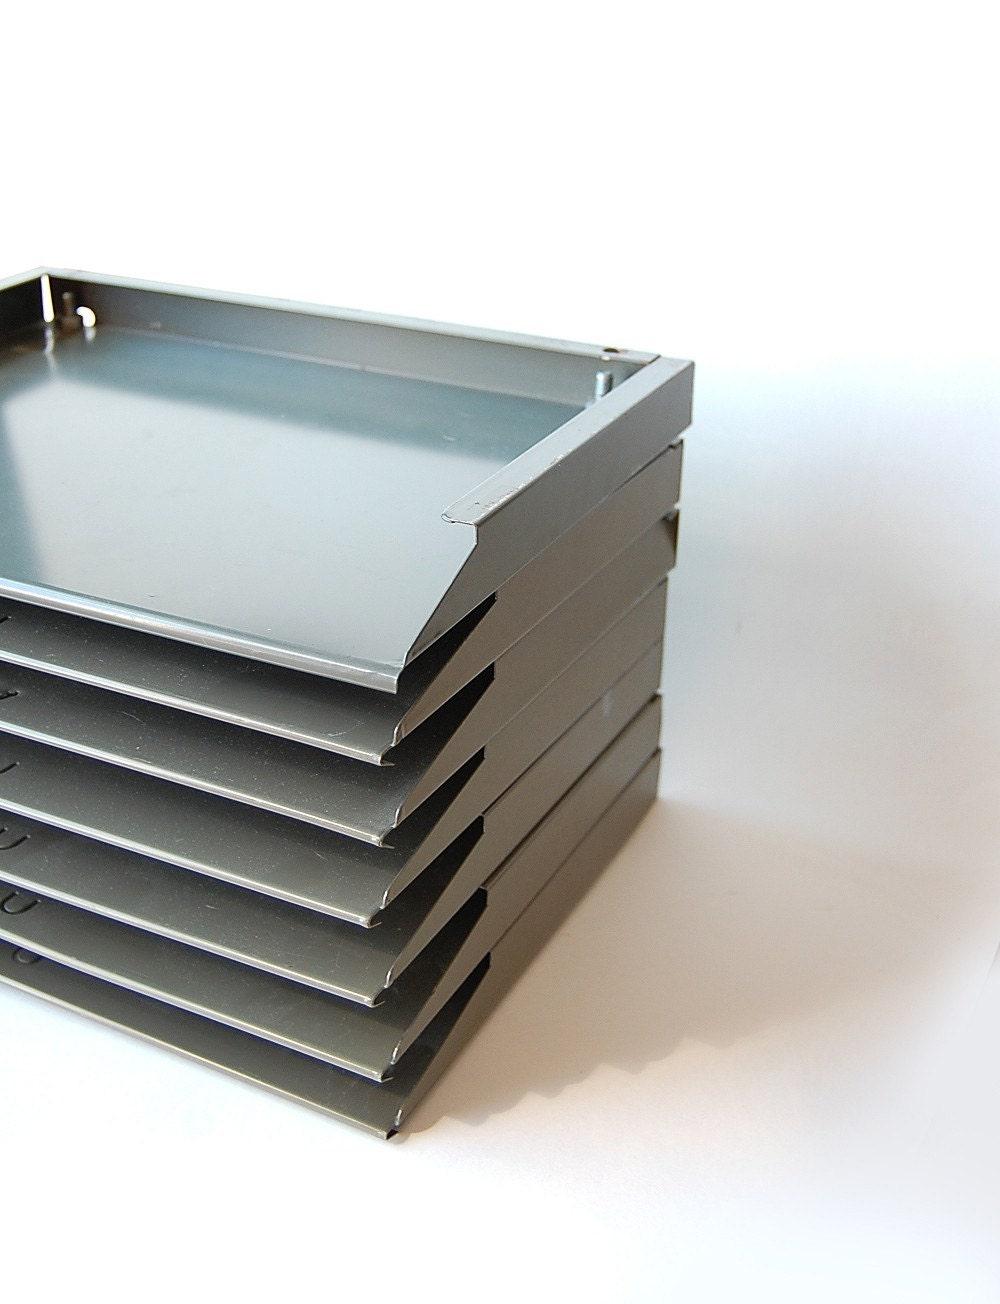 Vintage Industrial Desk File Organizer Metal